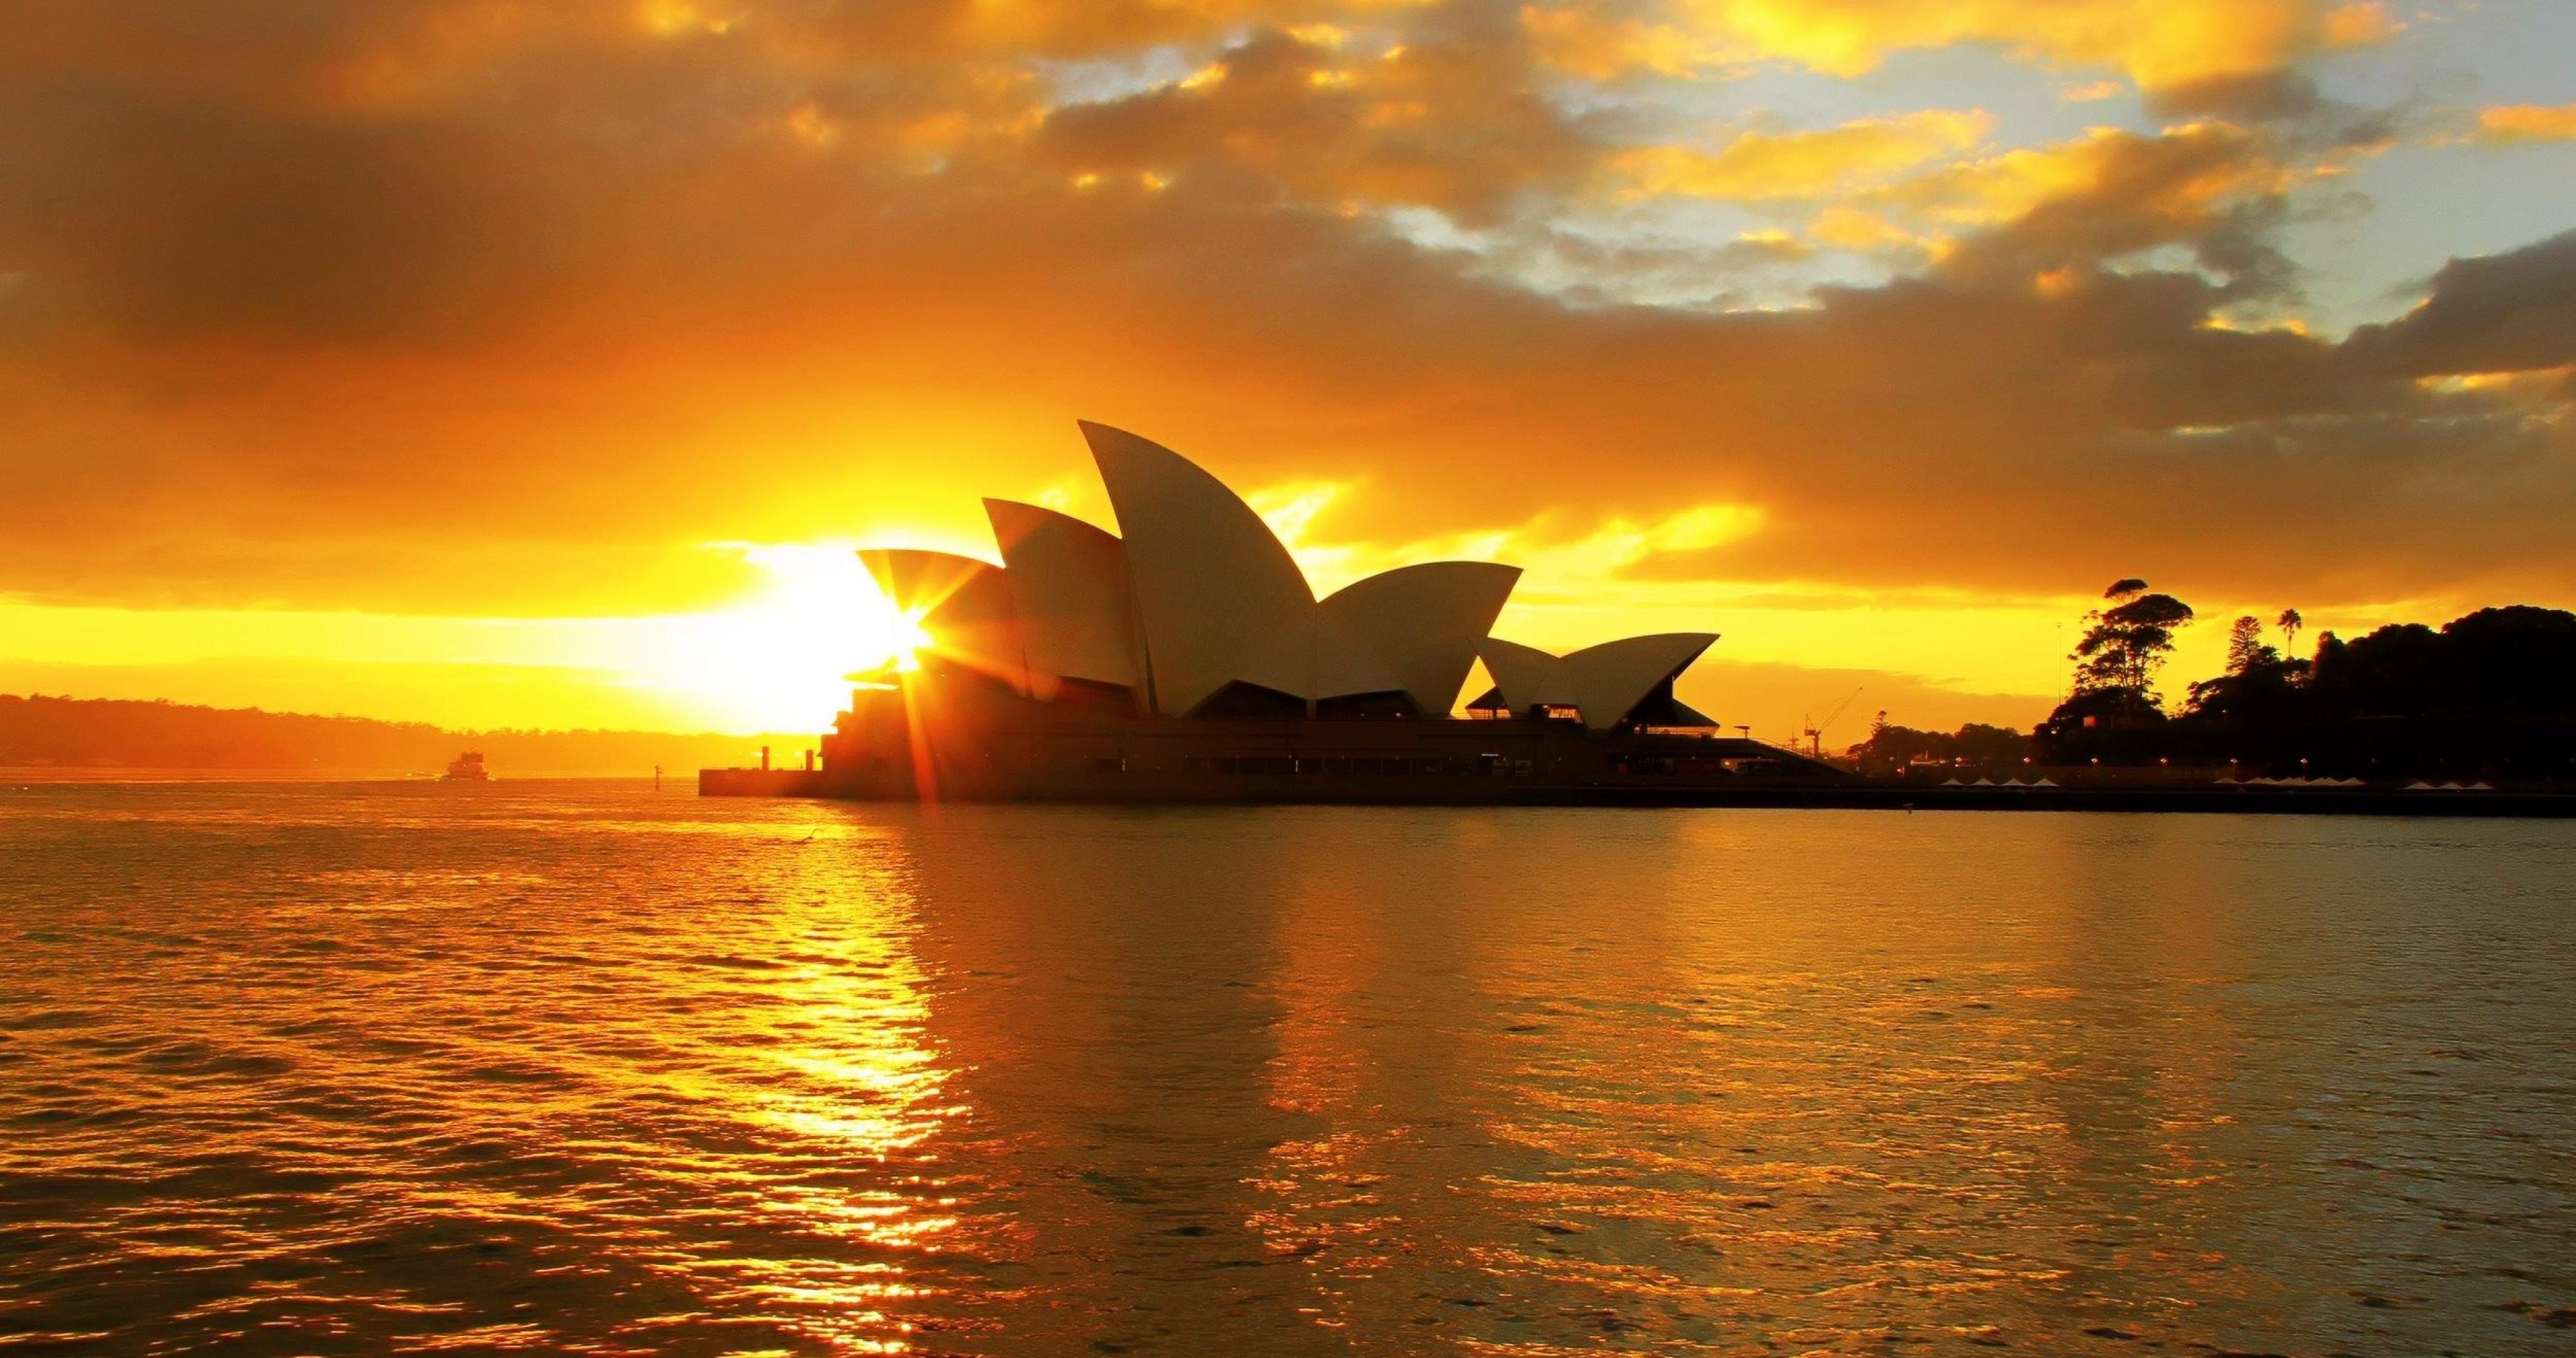 Sydney Australia Wallpaper Hd 4k Ultra Hd Wallpaper Sydney